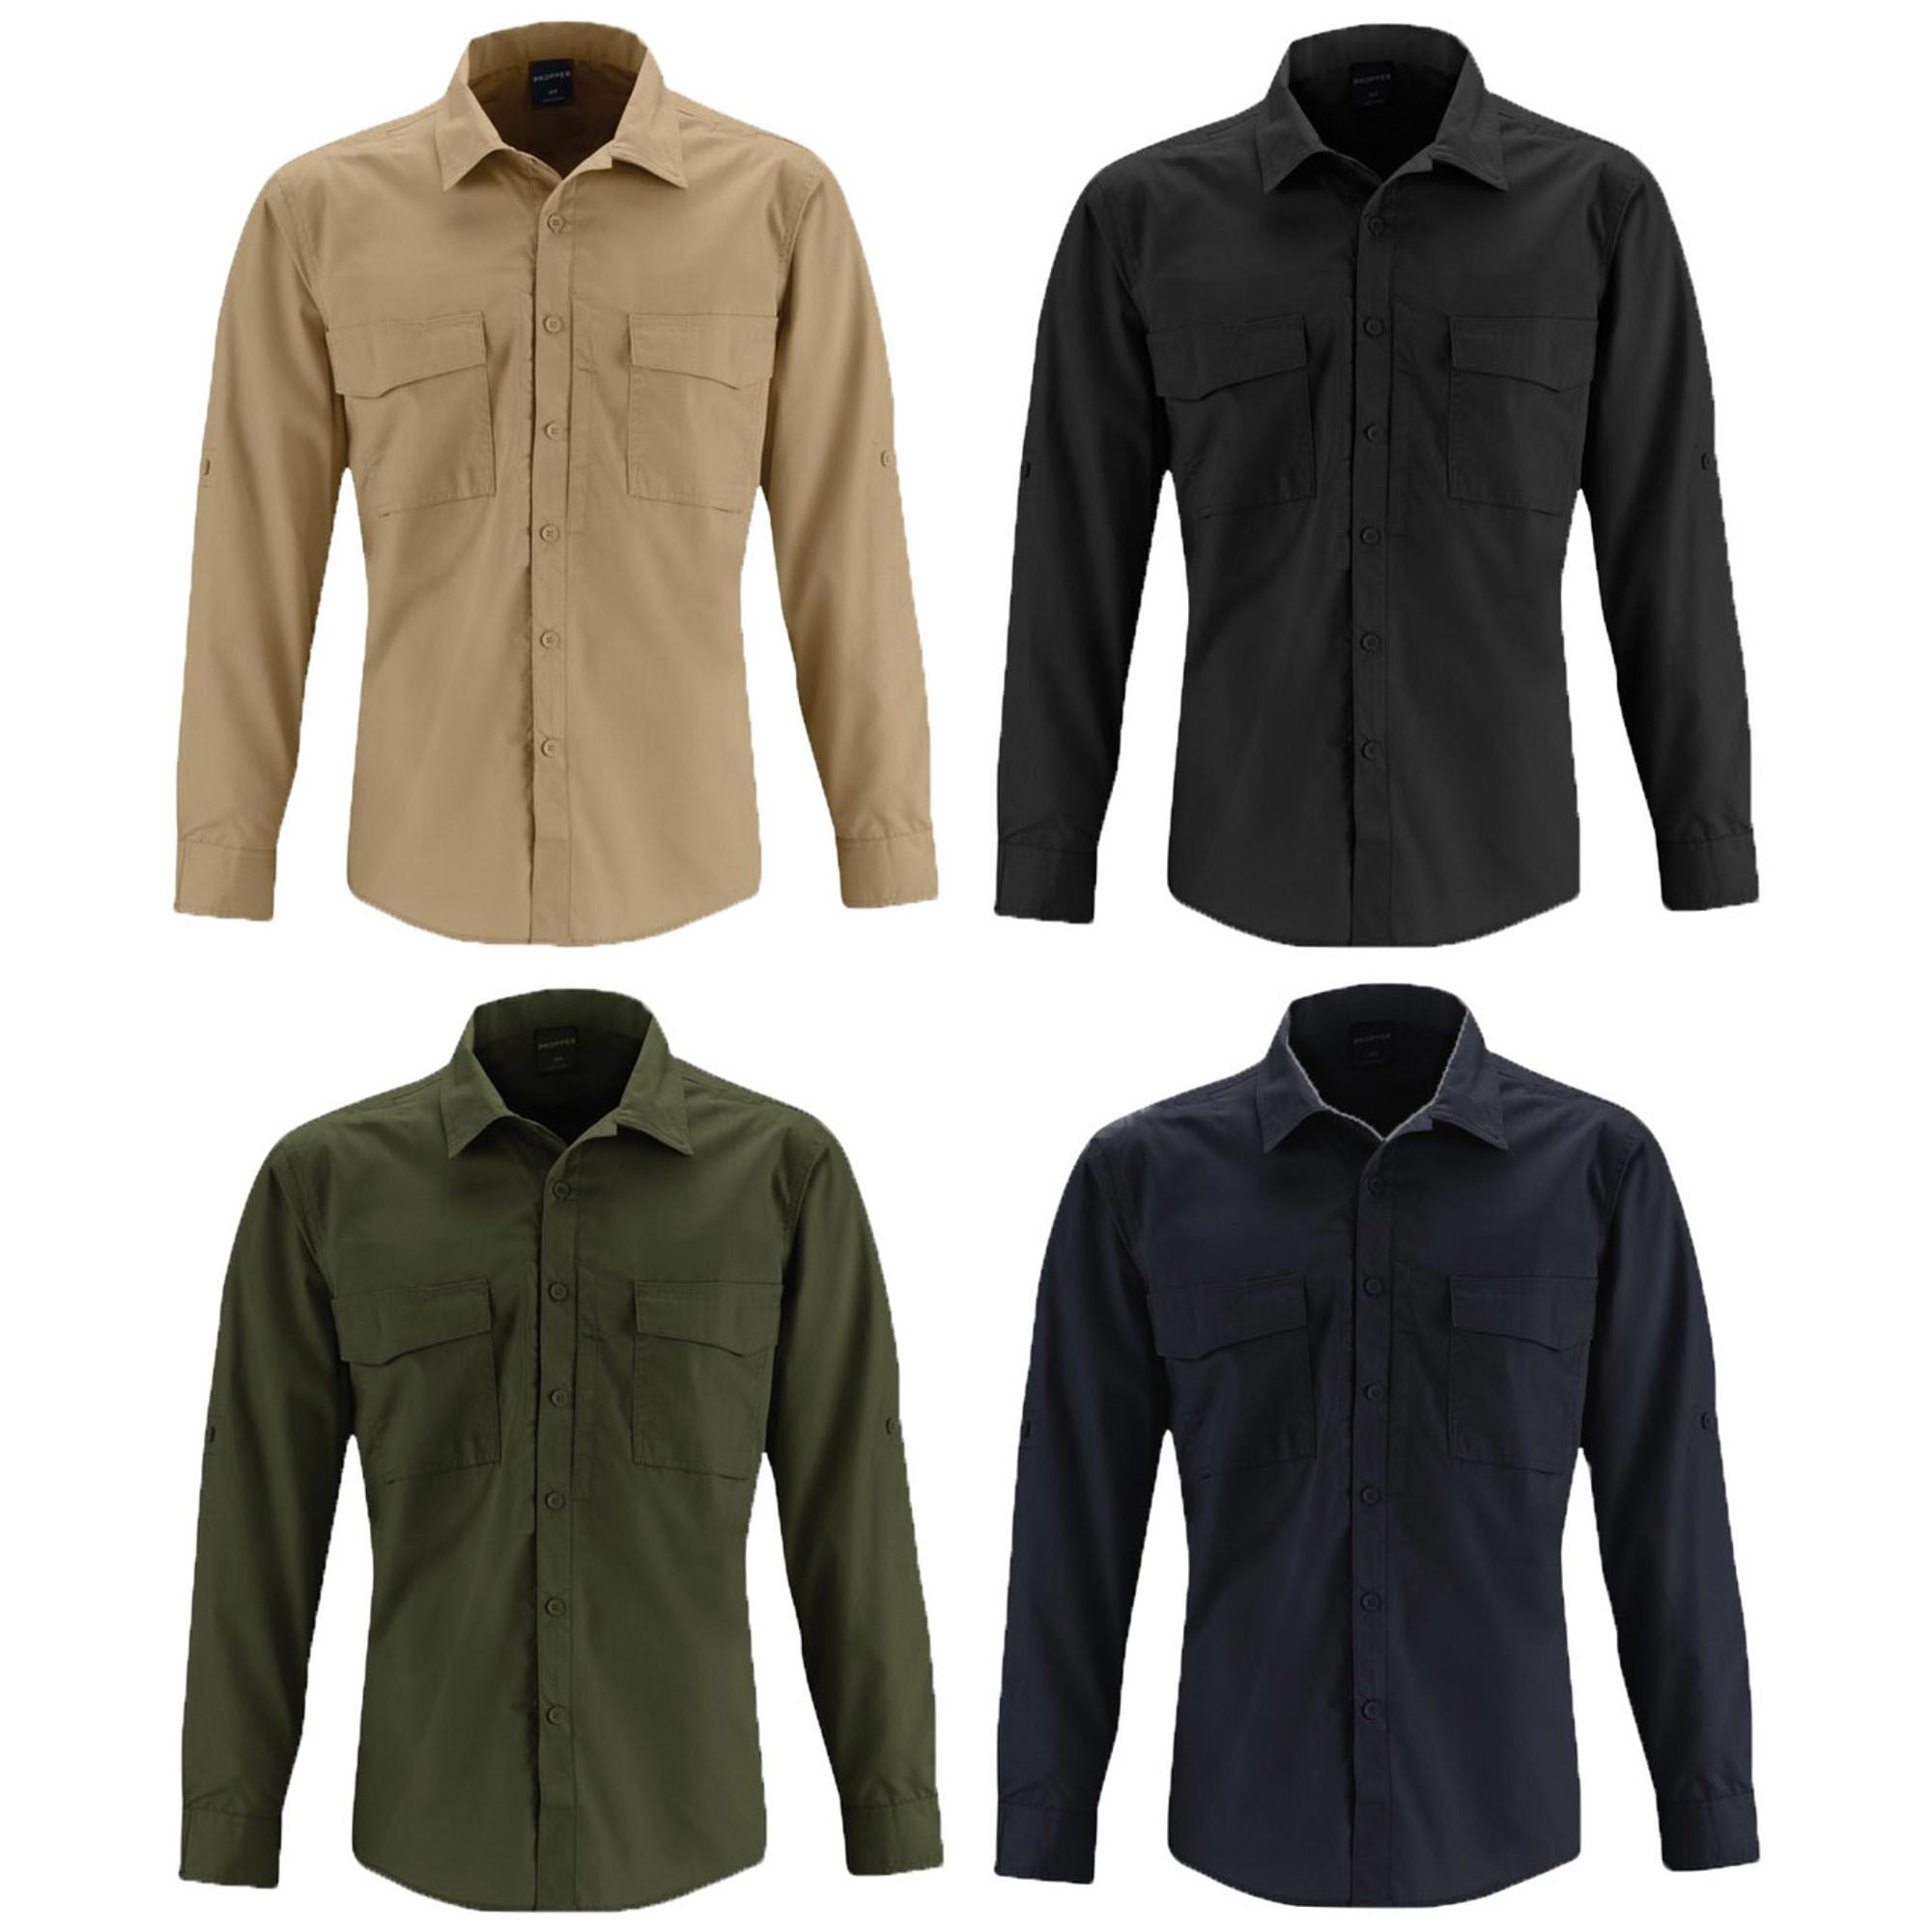 a675cb96 propper-revtac-shirt -ls-mens-hero-lapd-navy-f533450450_13all__40268.1550156882.jpg?c=2